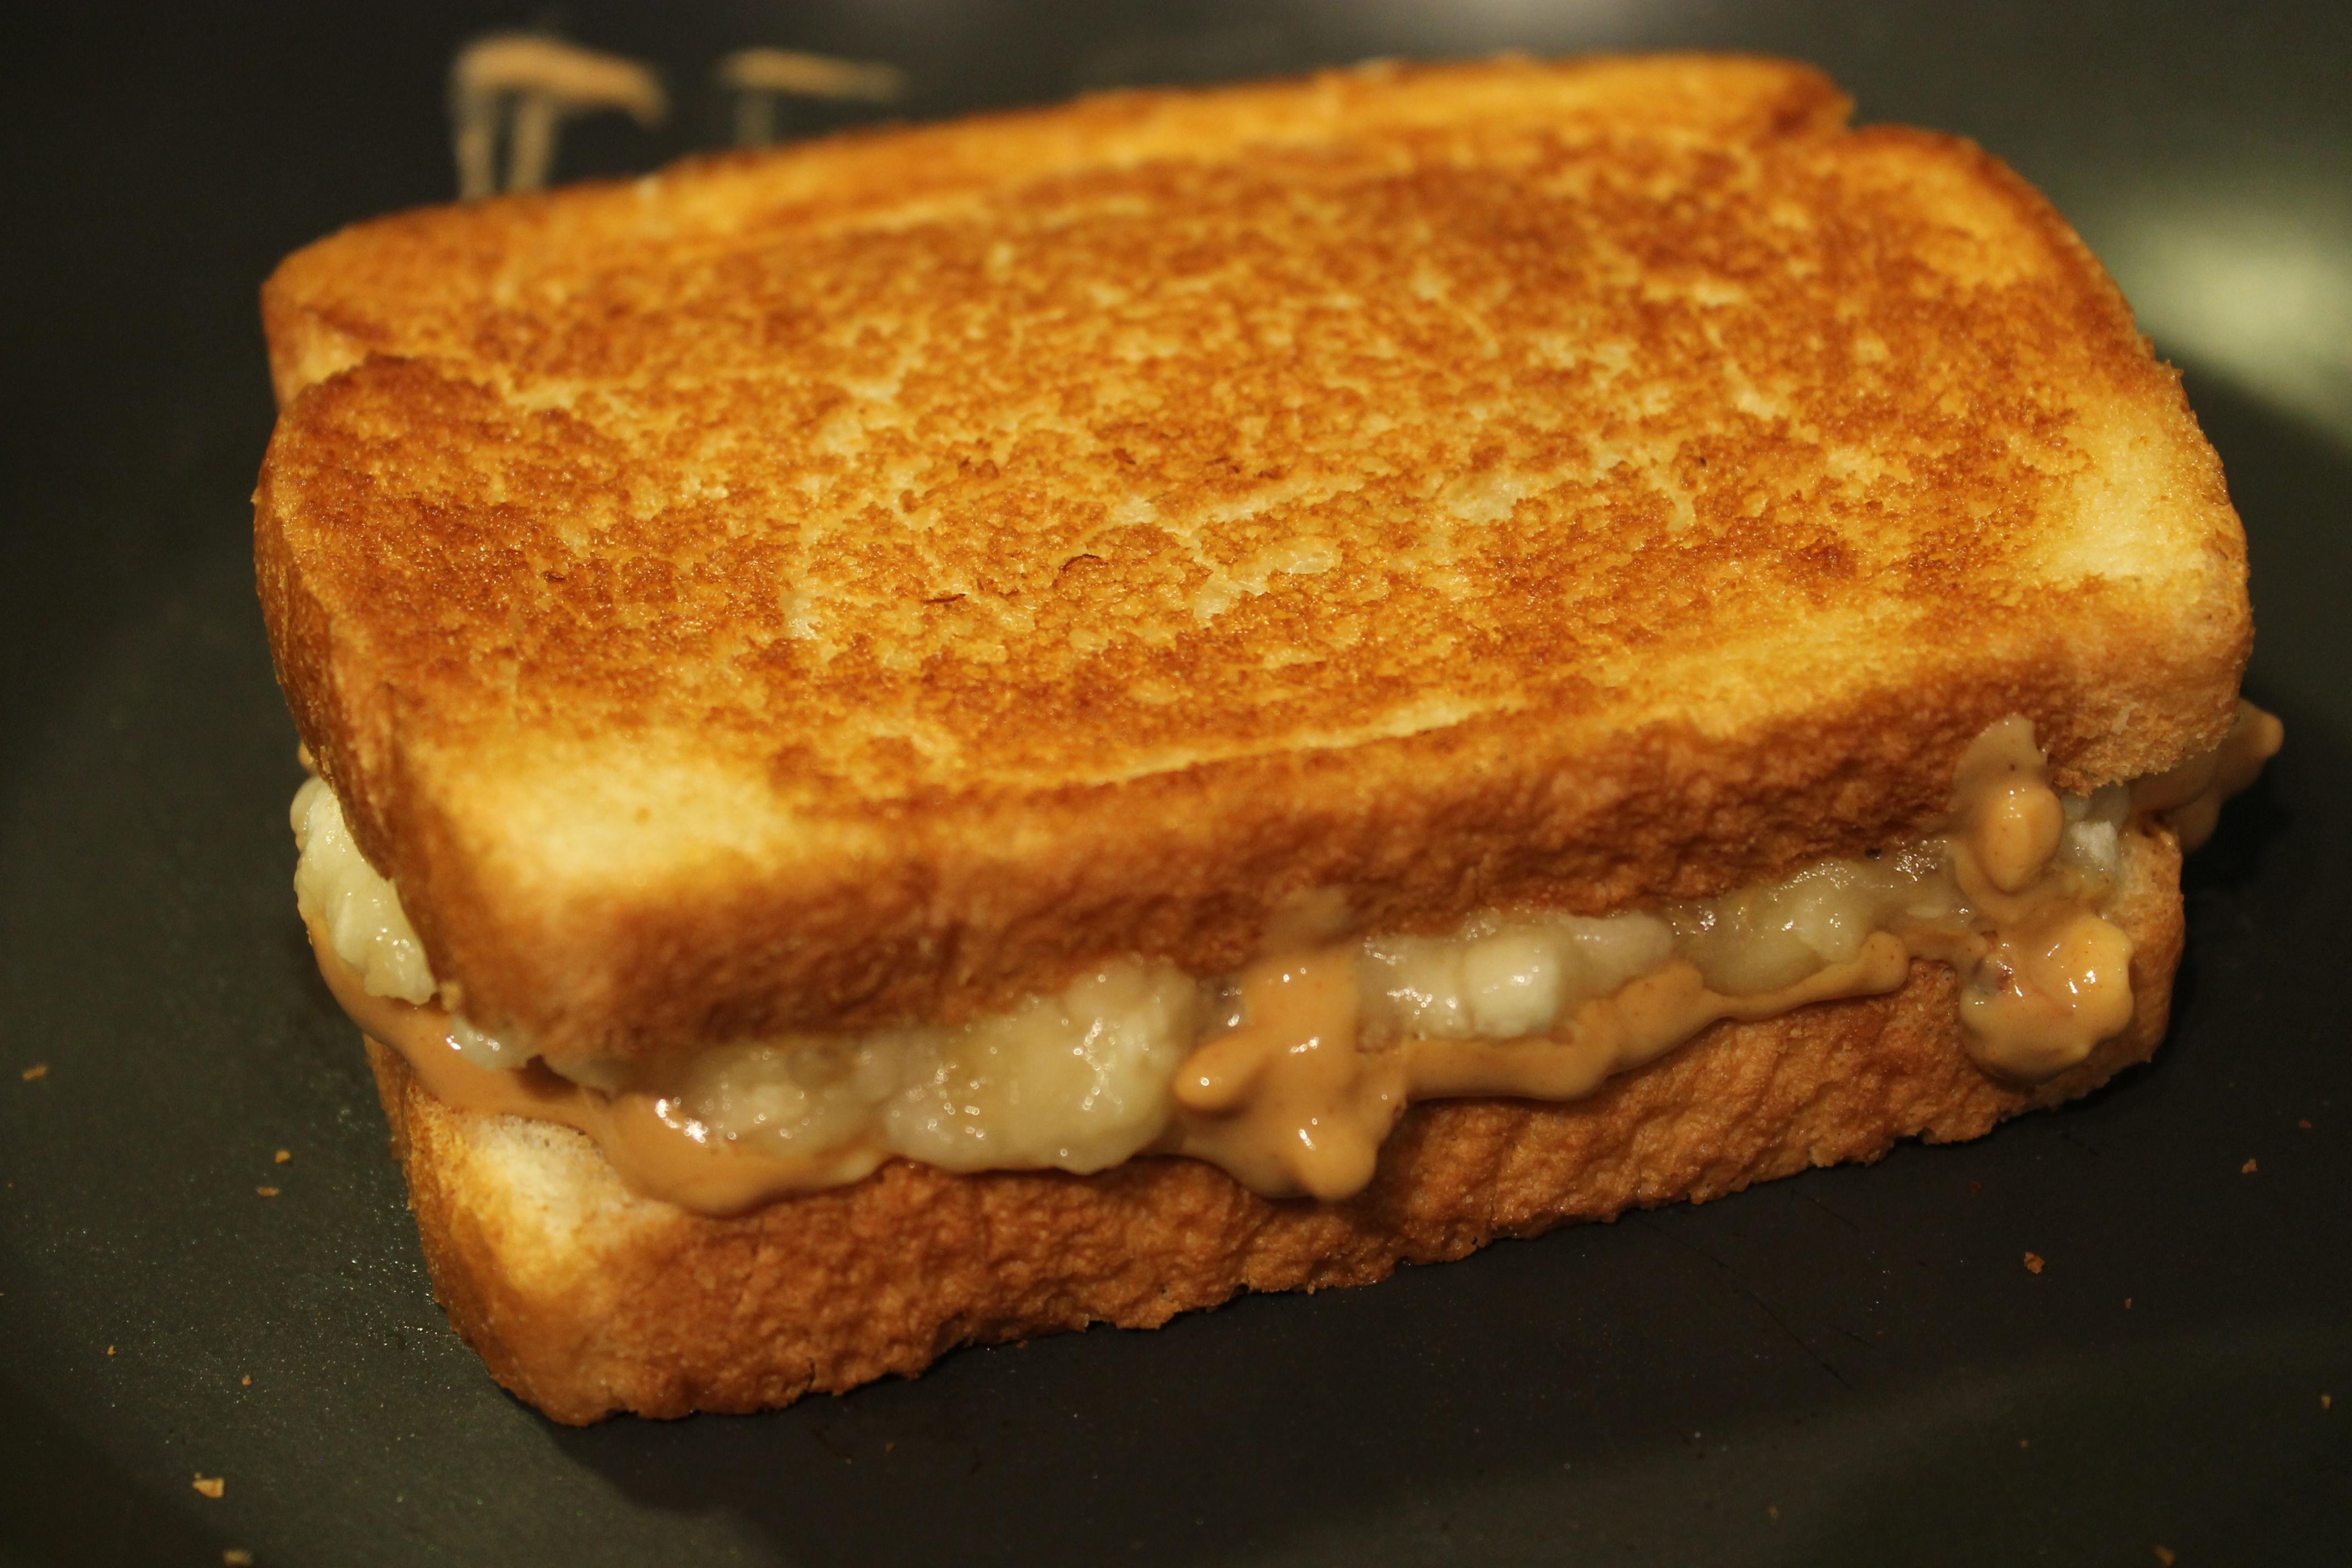 Elvis Presley S Peanut Butter Banana Sandwich Tartqueen S Kitchen